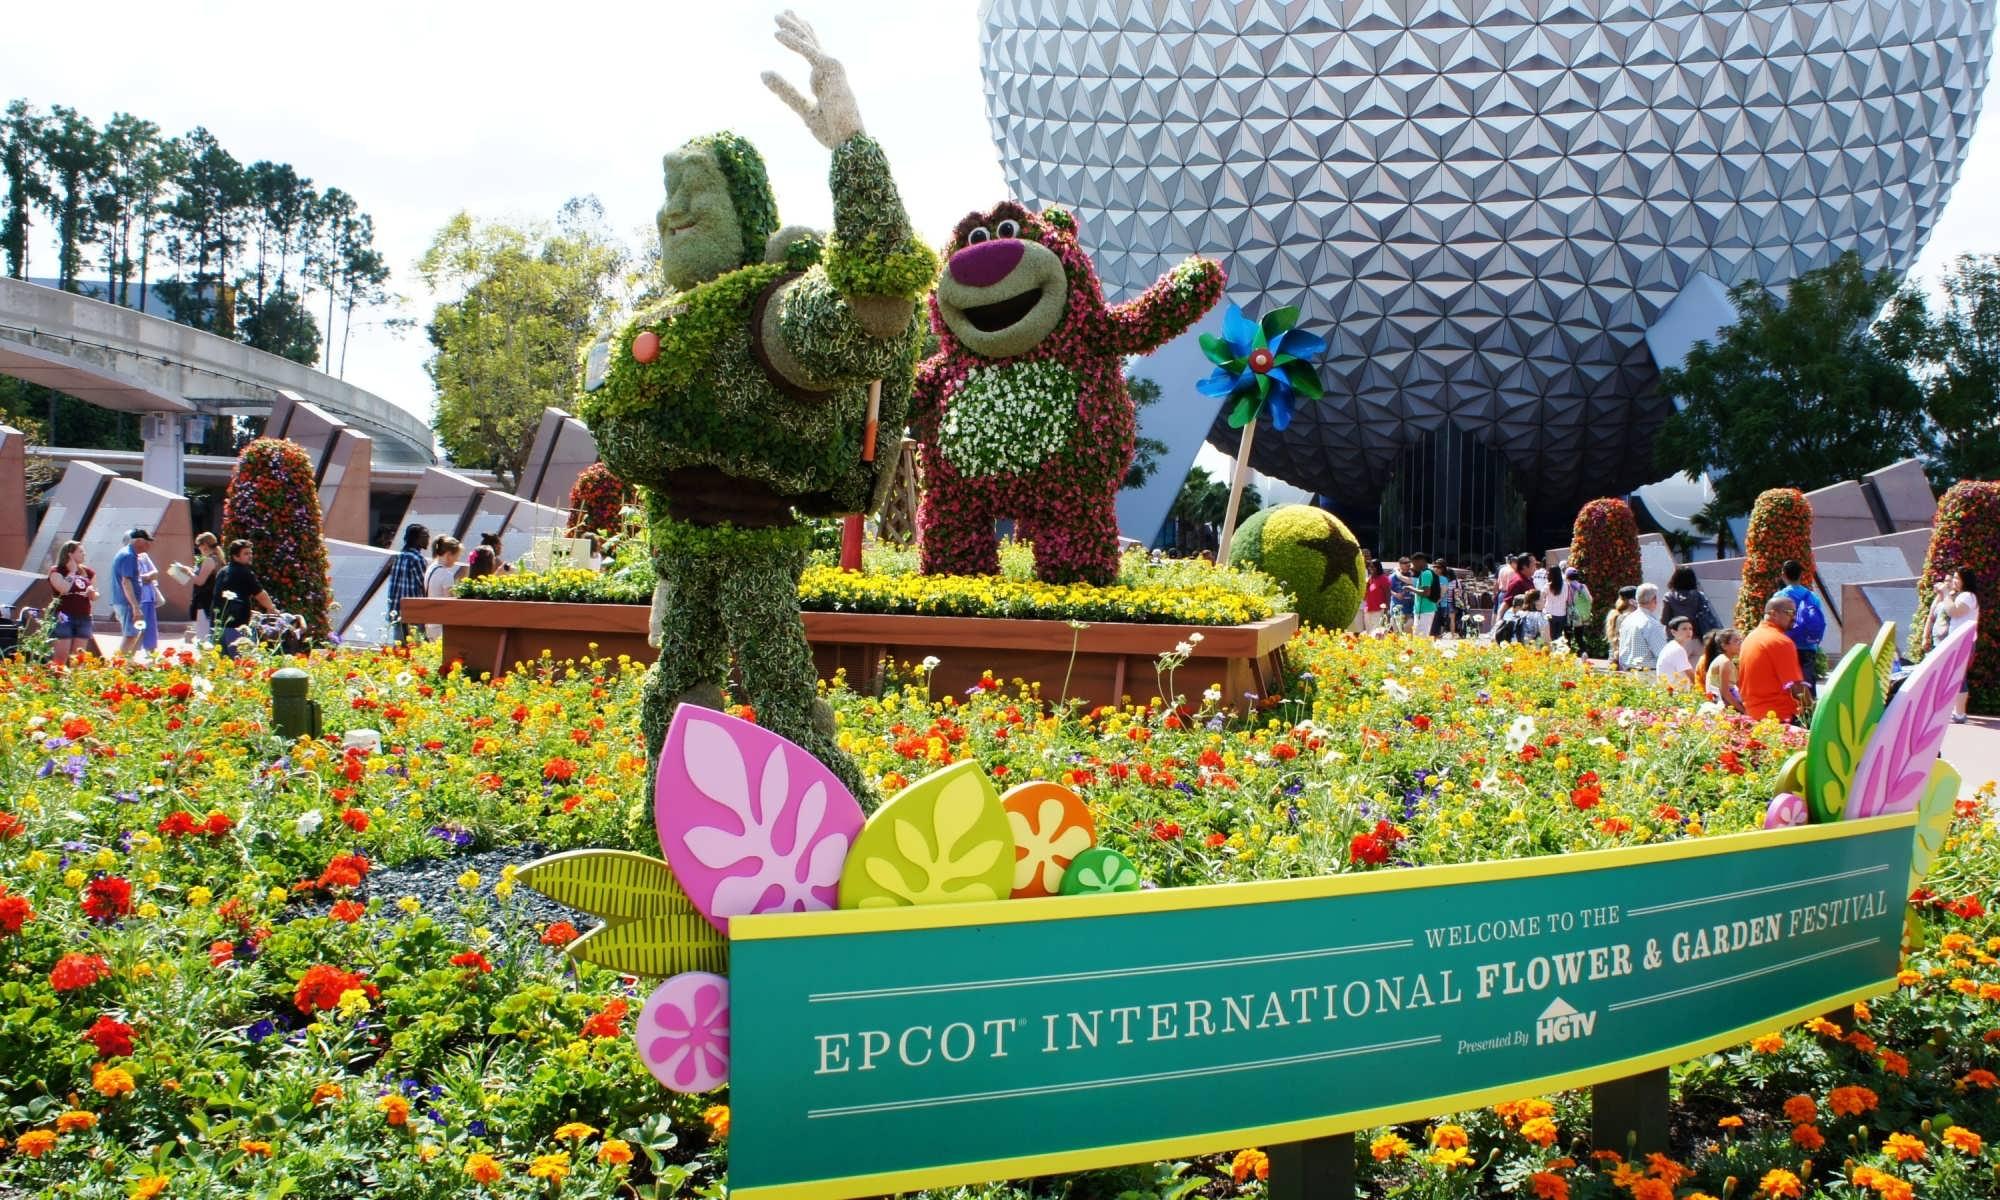 2013 epcot international flower & garden festival march 6 - may 19